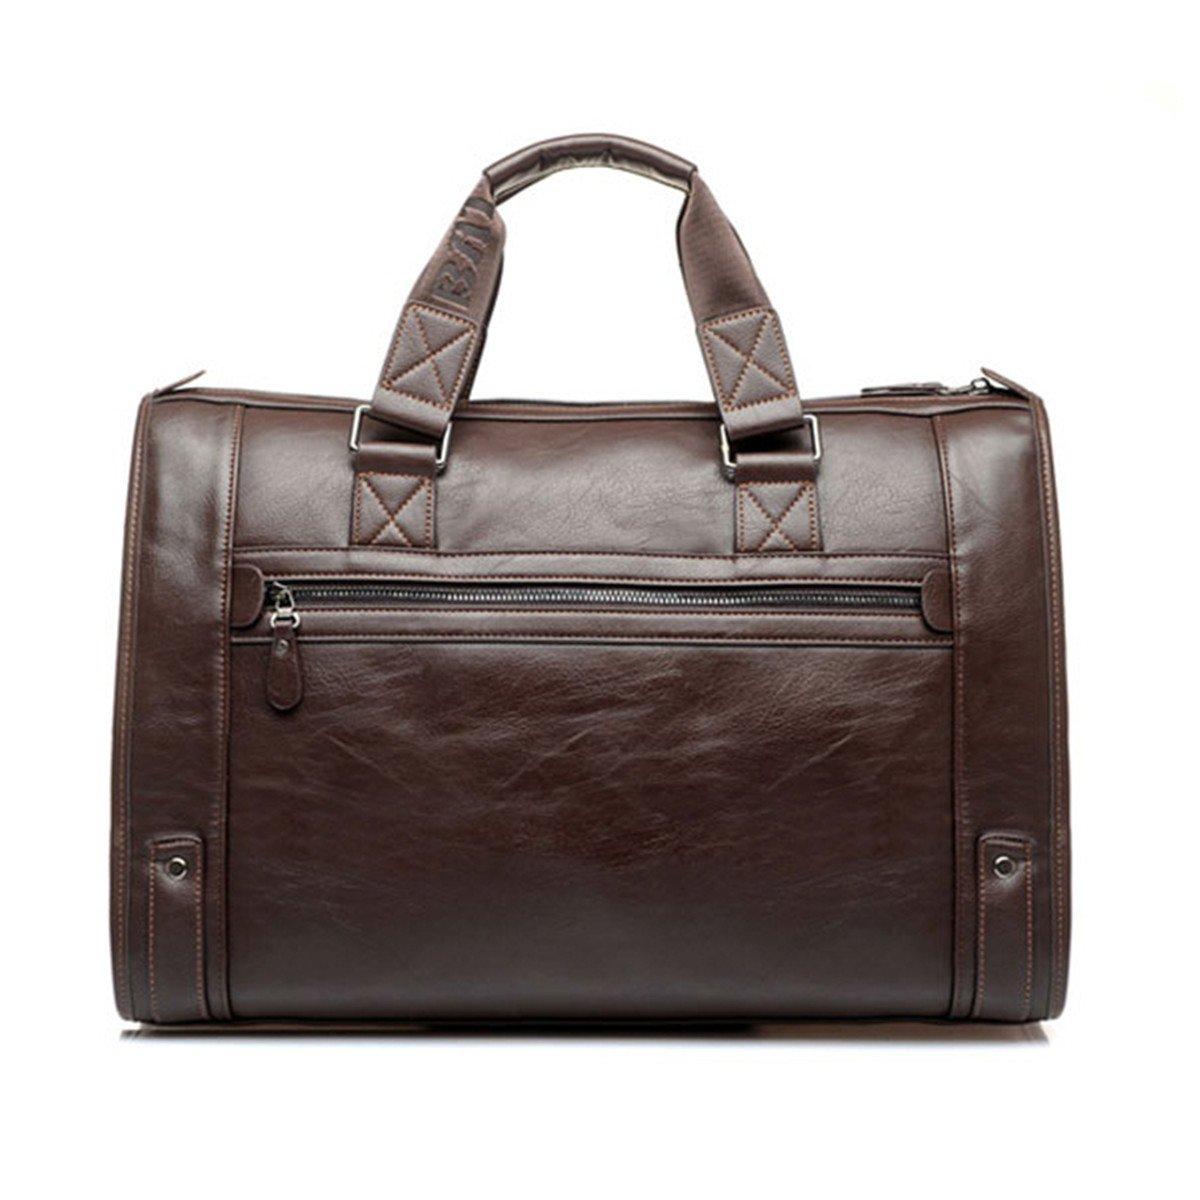 Amazon.com   gracosy Vintage Briefcase, Leather Business Bag Mens Large Working Bag Laptop Bag Teacher Bag for Travel Office Black-Medium 15.4 11.8 ...